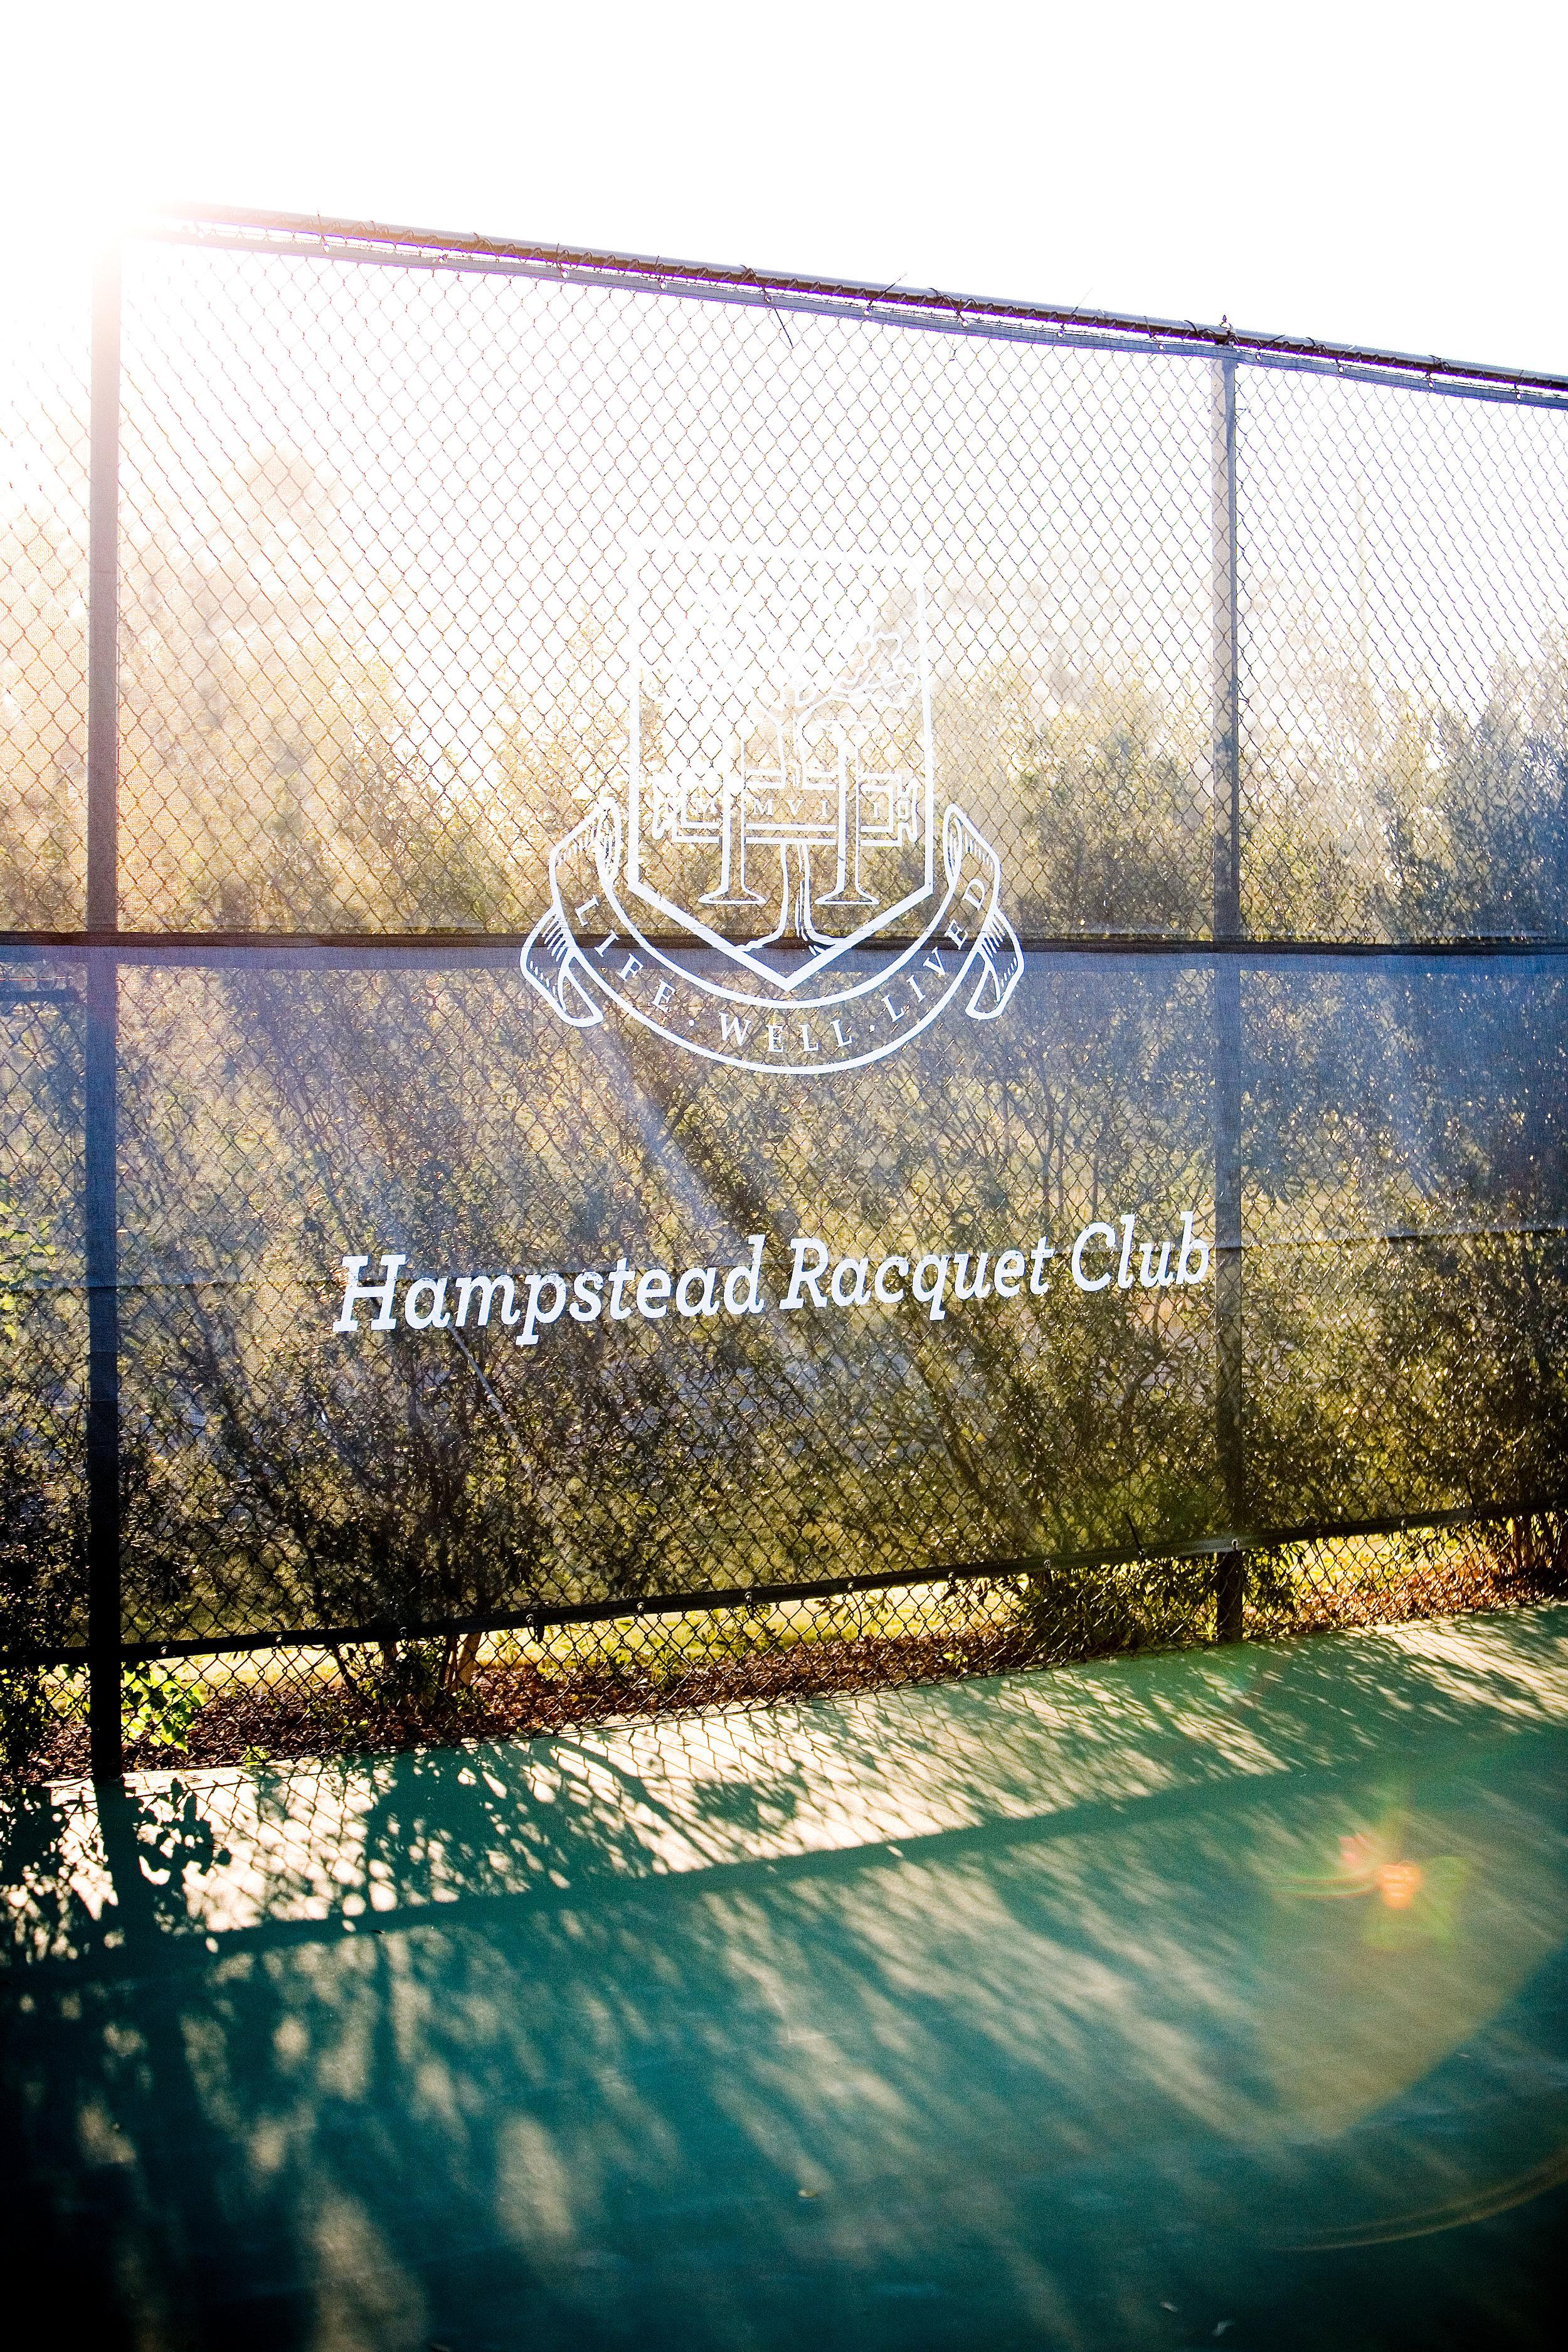 065 Hampstead1011-2  copy.jpg